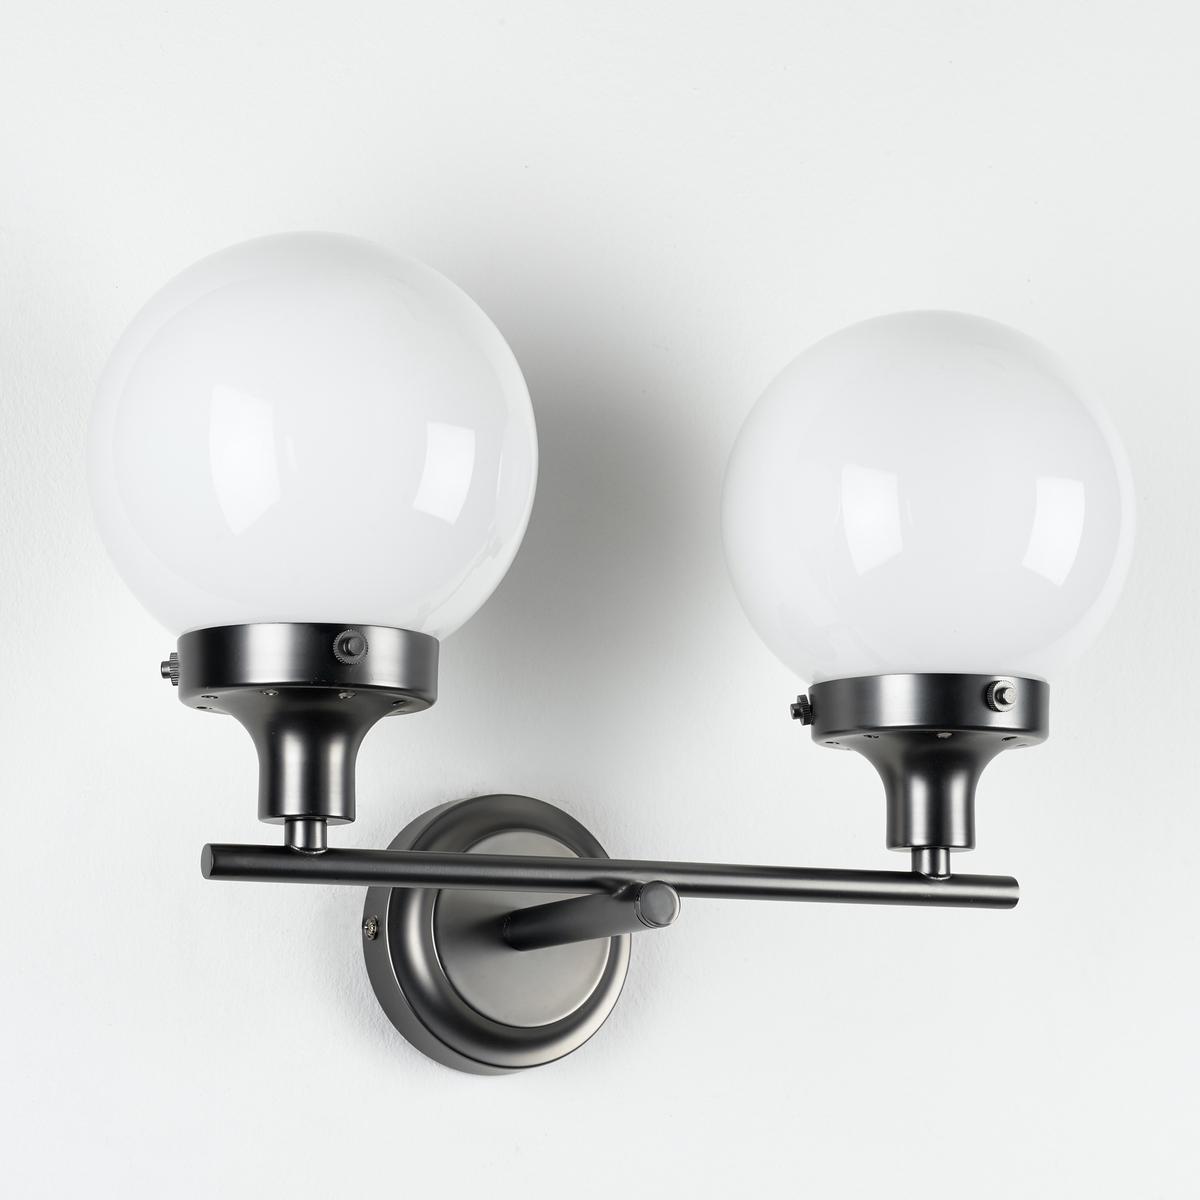 Бра с 2 светильниками, Cocinero